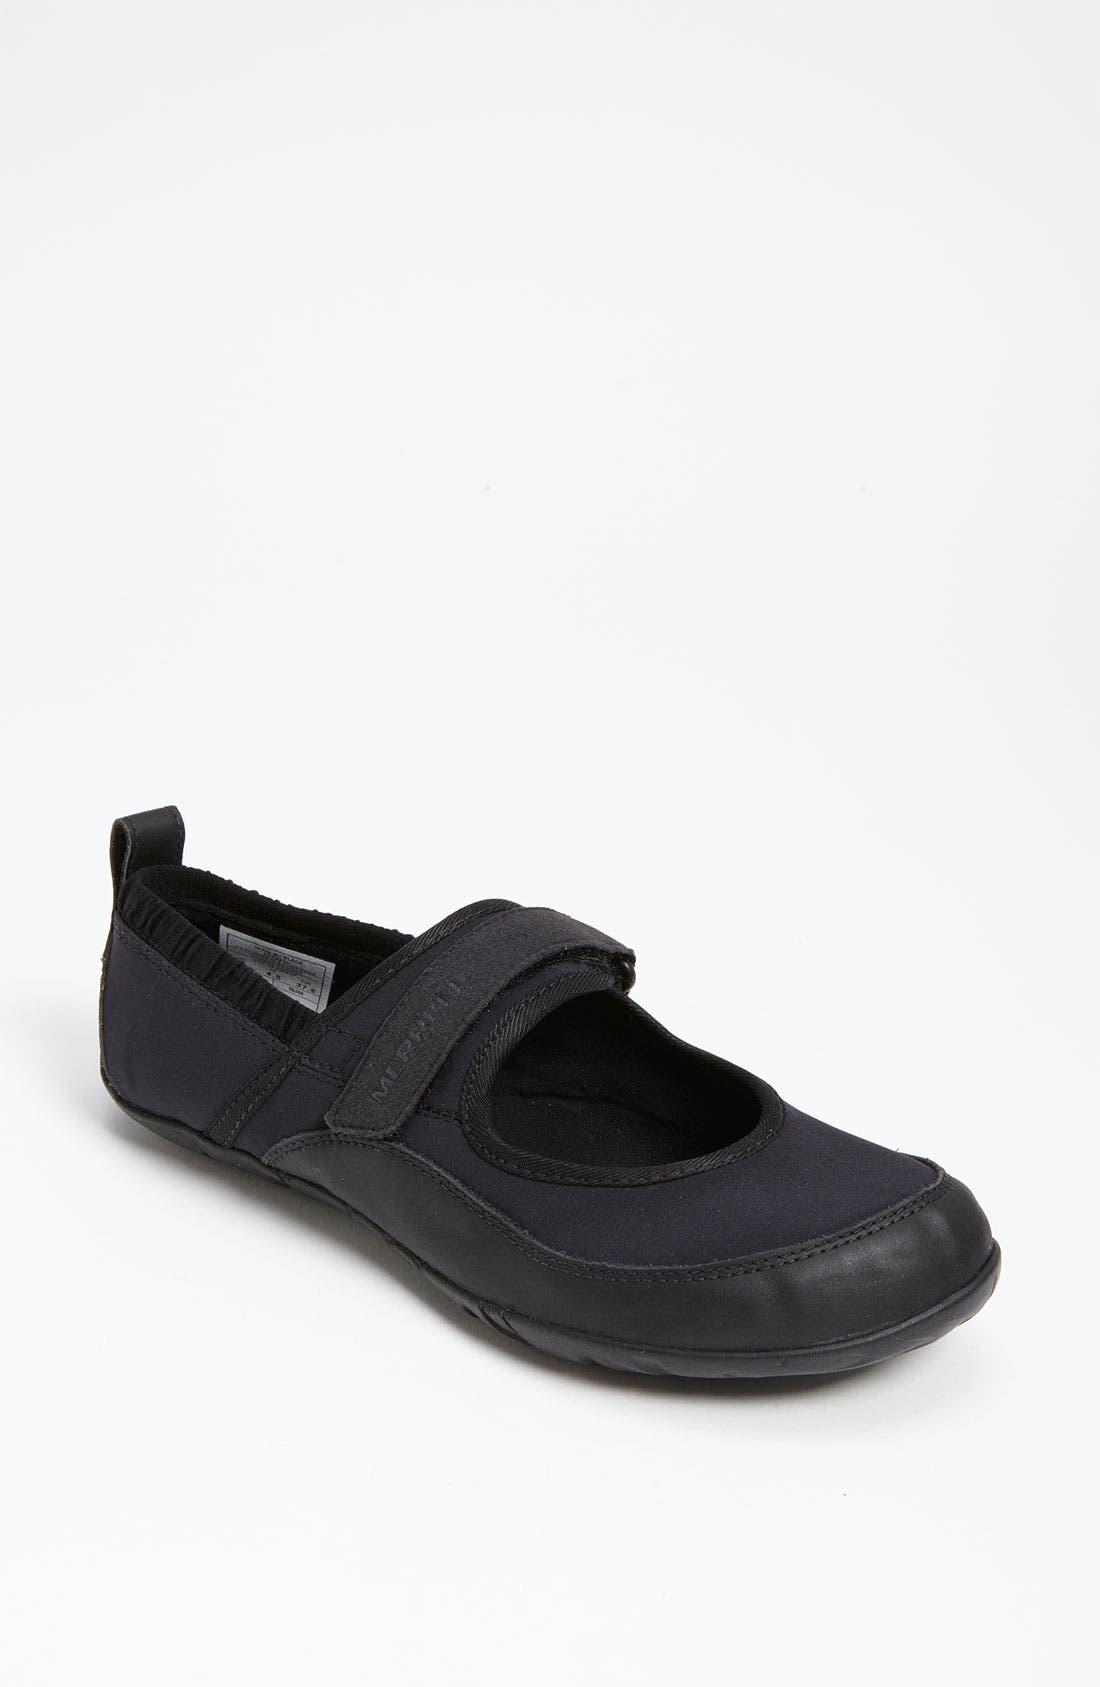 Alternate Image 1 Selected - Merrell 'Stretch Glove' Training Shoe